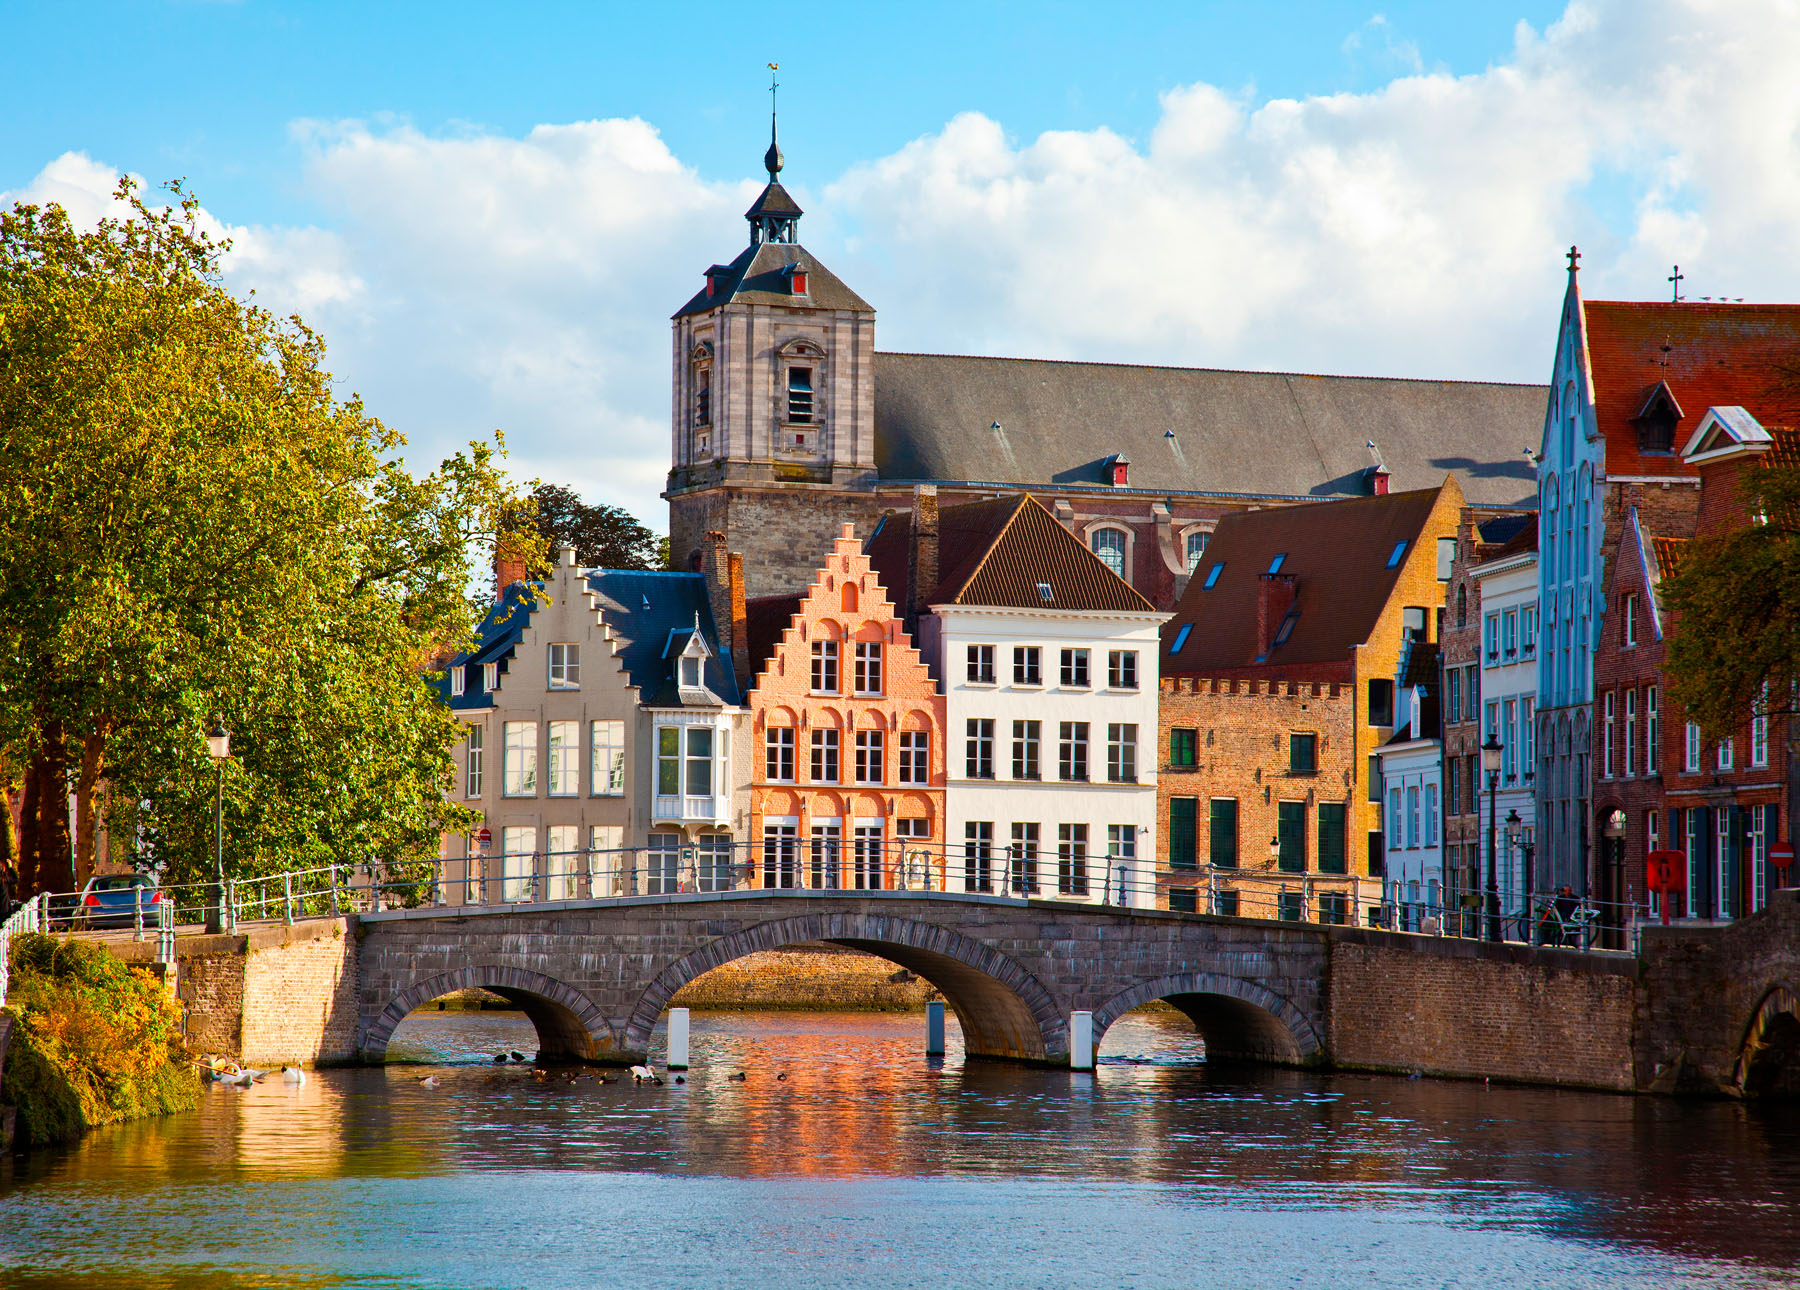 Brugge_128373122-20161125-160433